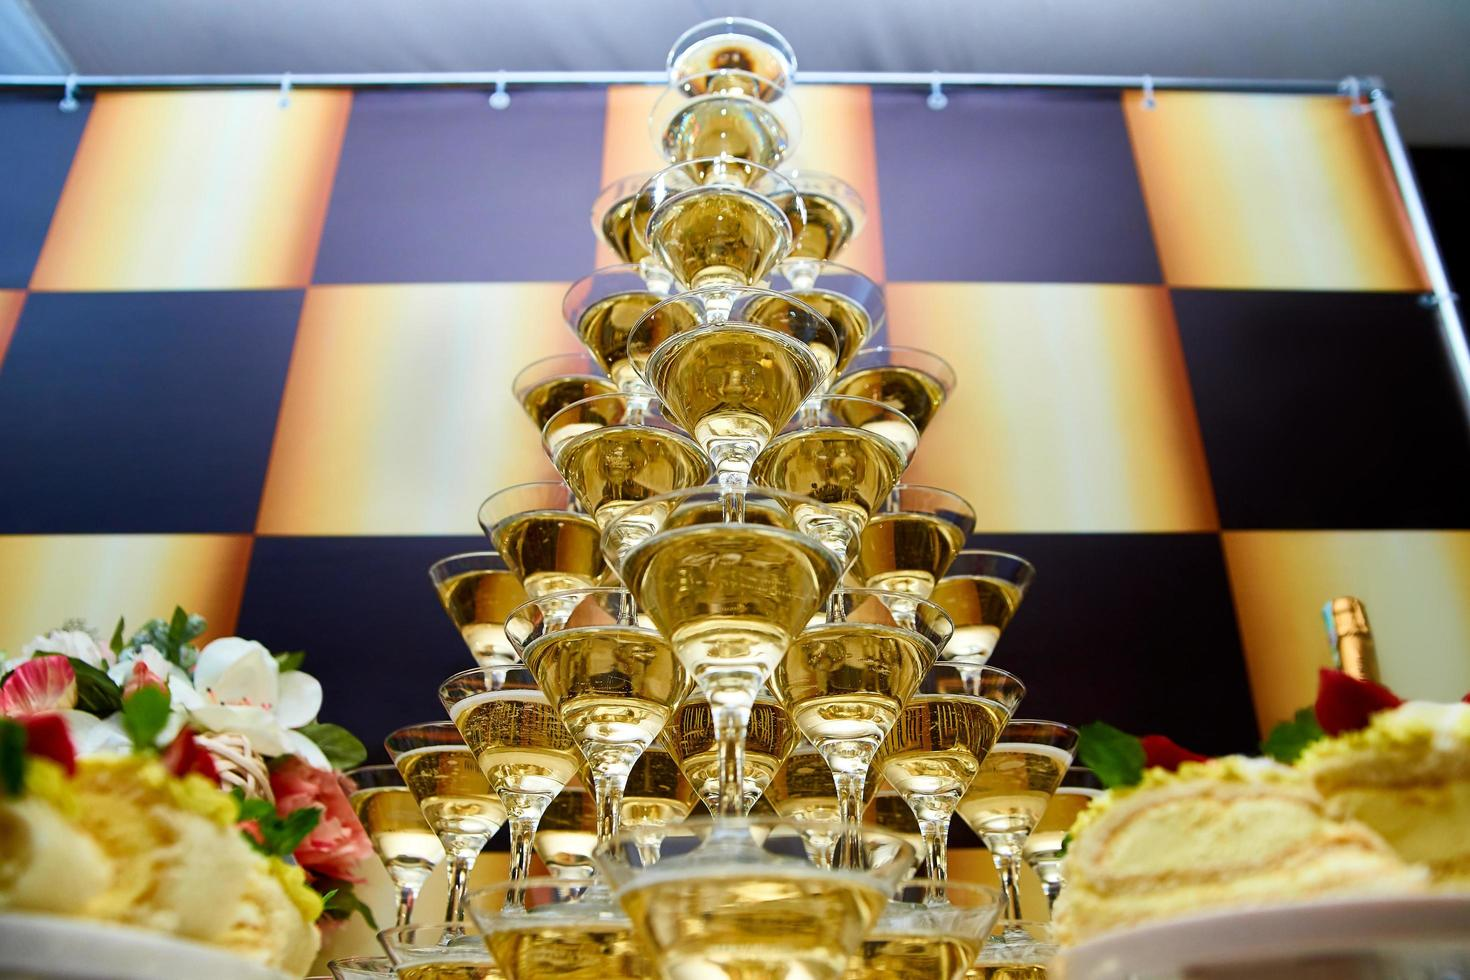 Pyramid of champagne photo